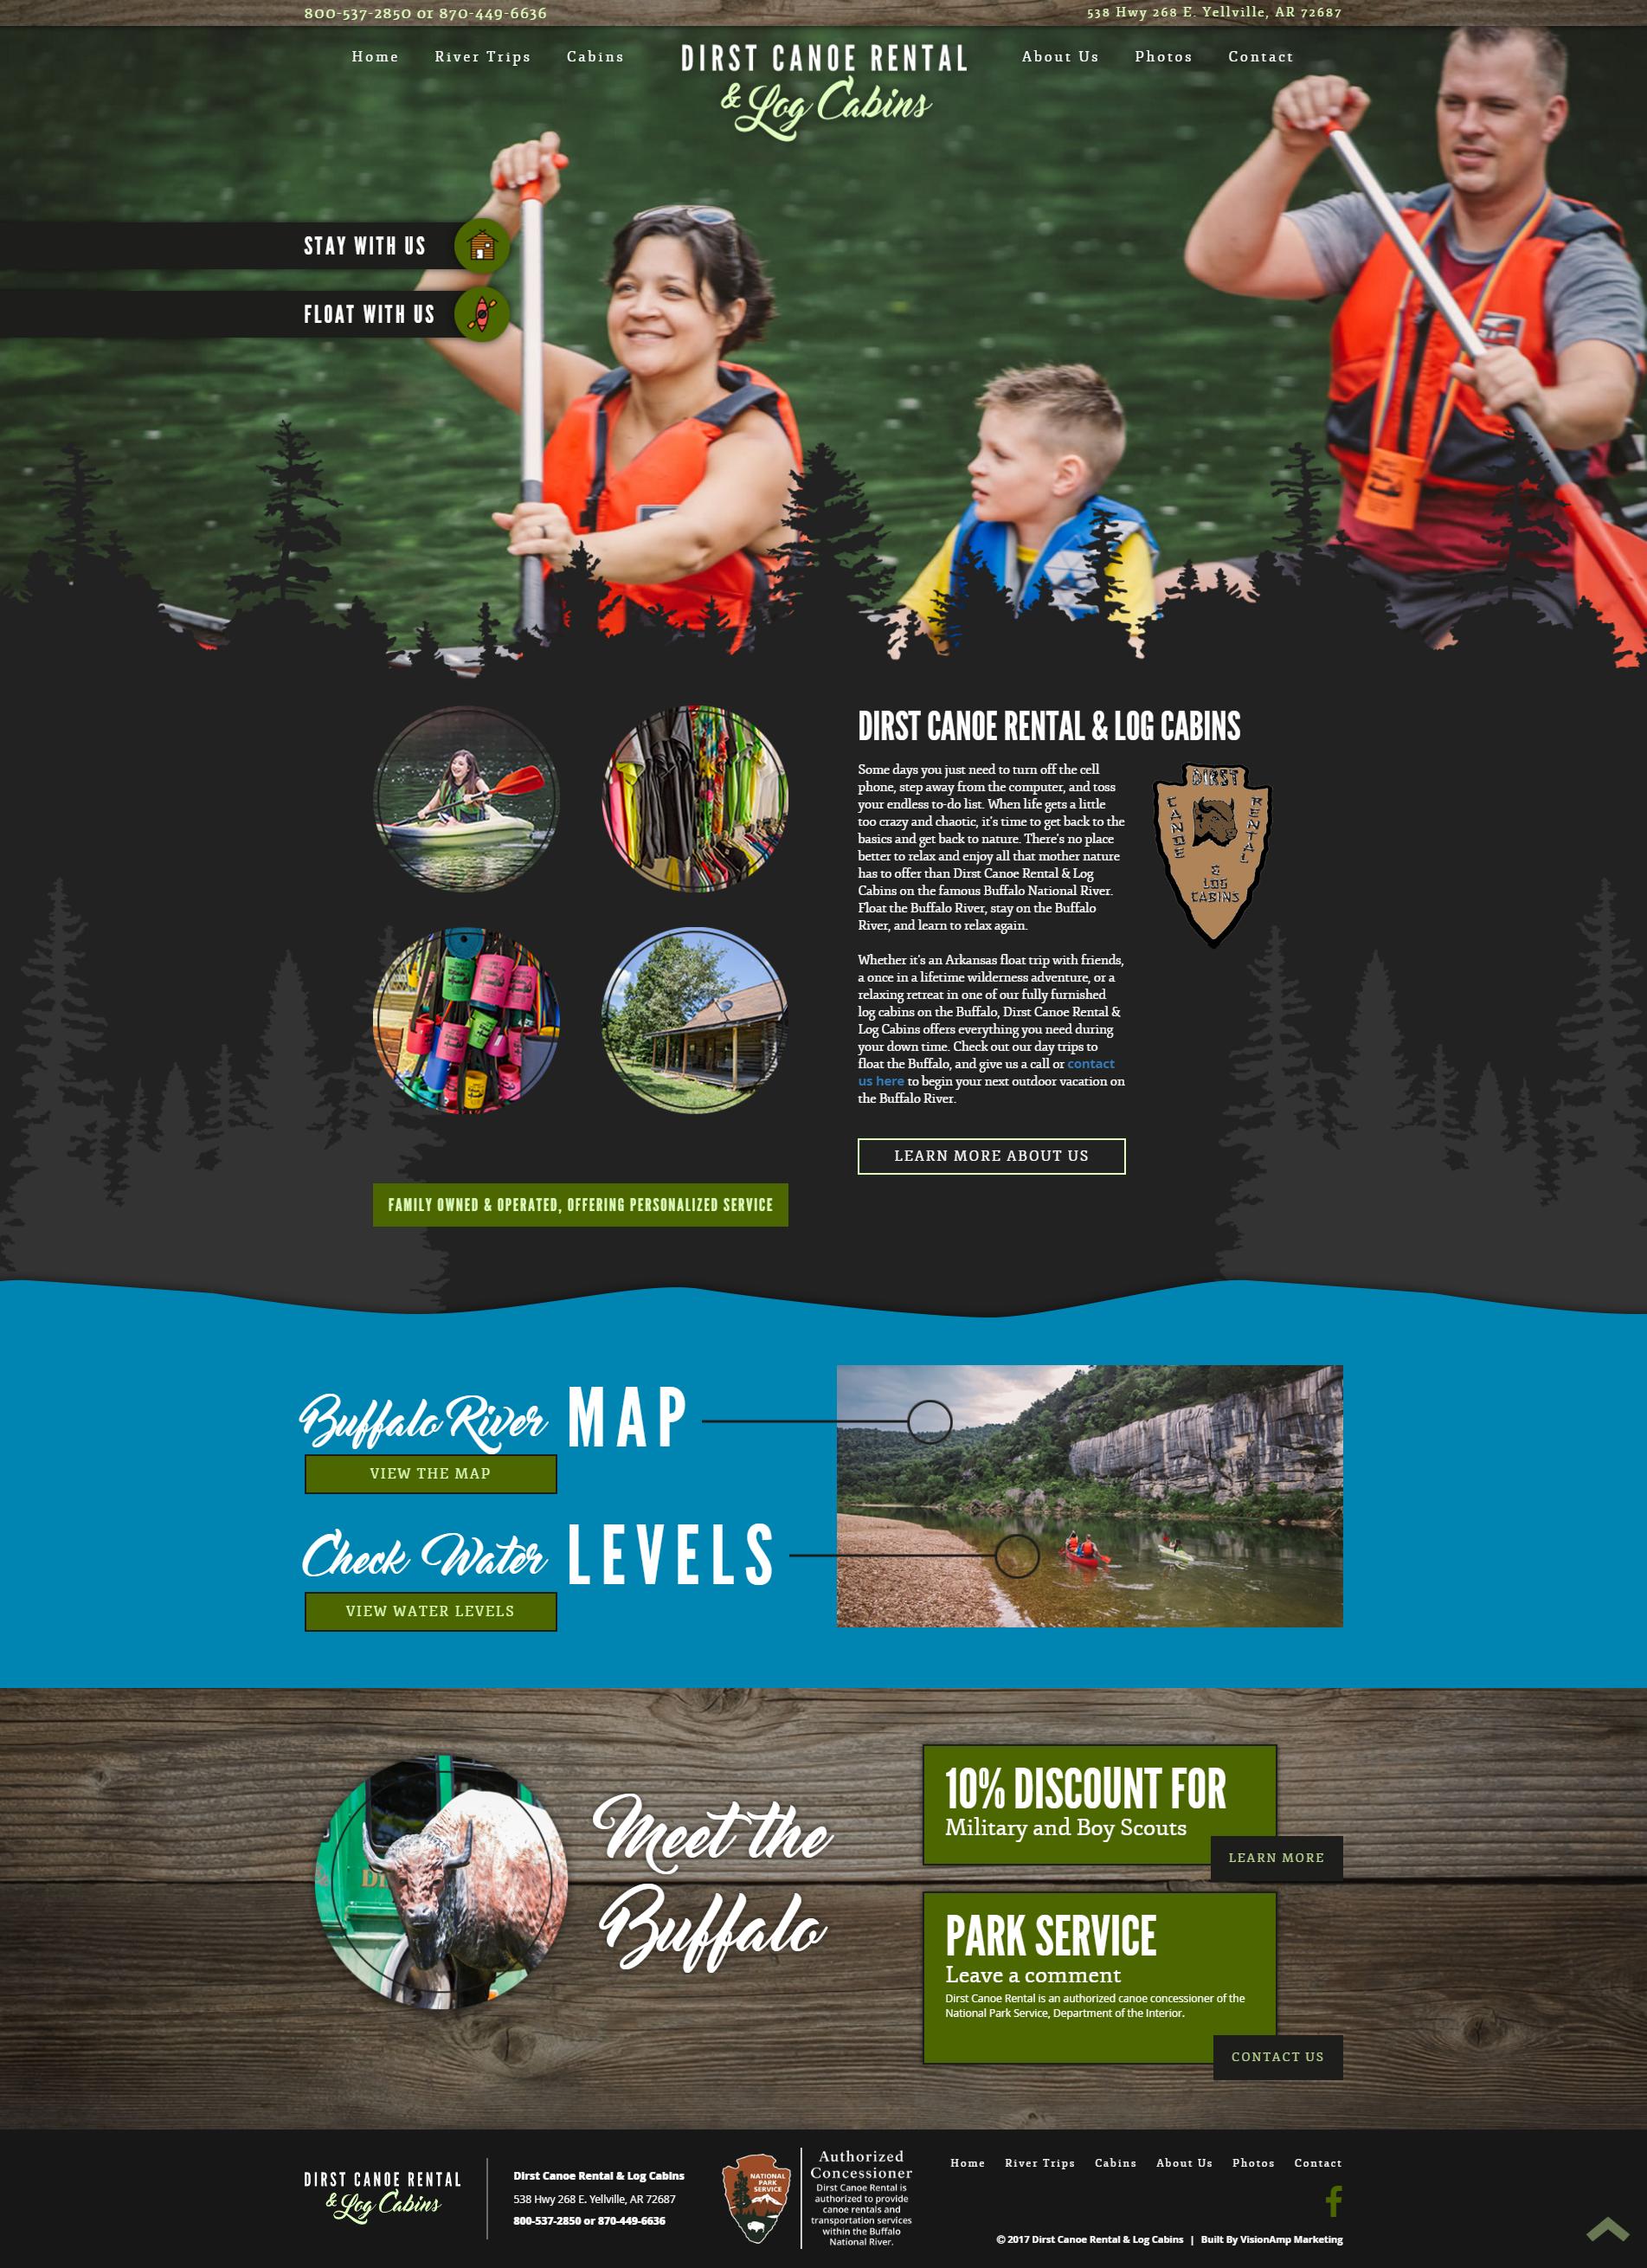 Dirst Canoe Rental Full Web Design Image